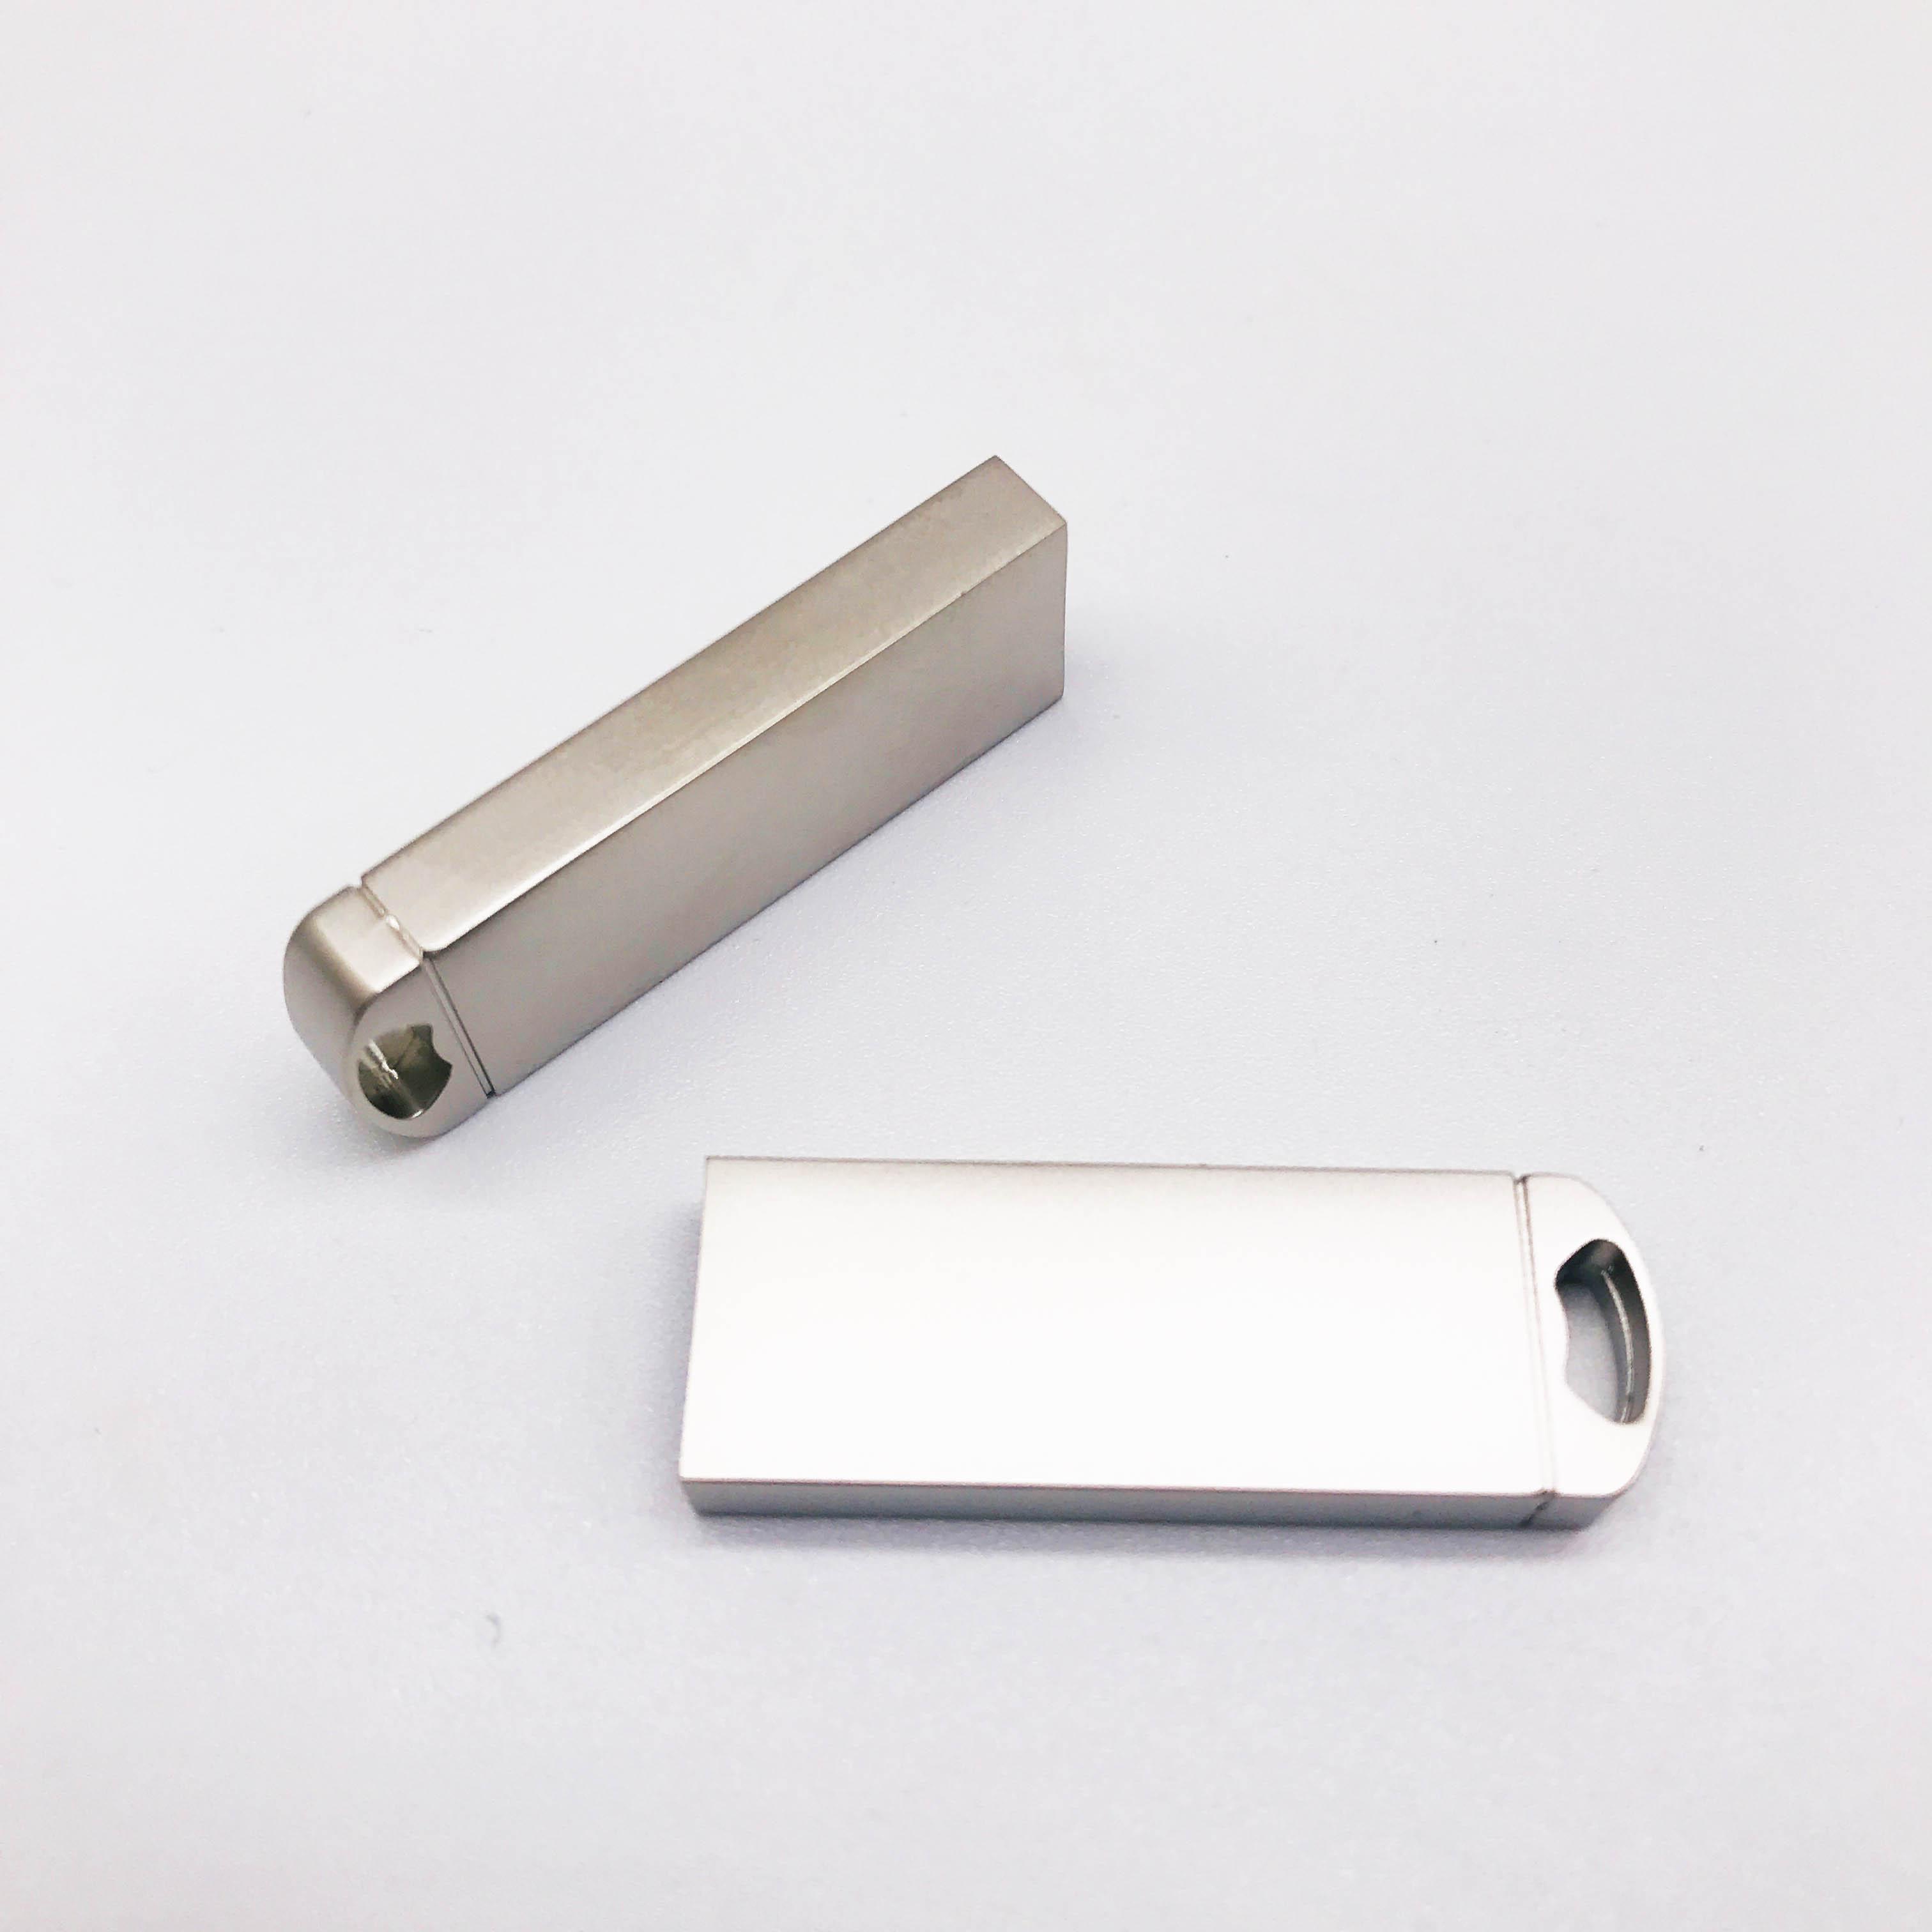 USB 2.0 Flash Drives Metal Memorias Pendrive 4GB Memory Sticks Pen Drive - USBSKY | USBSKY.NET